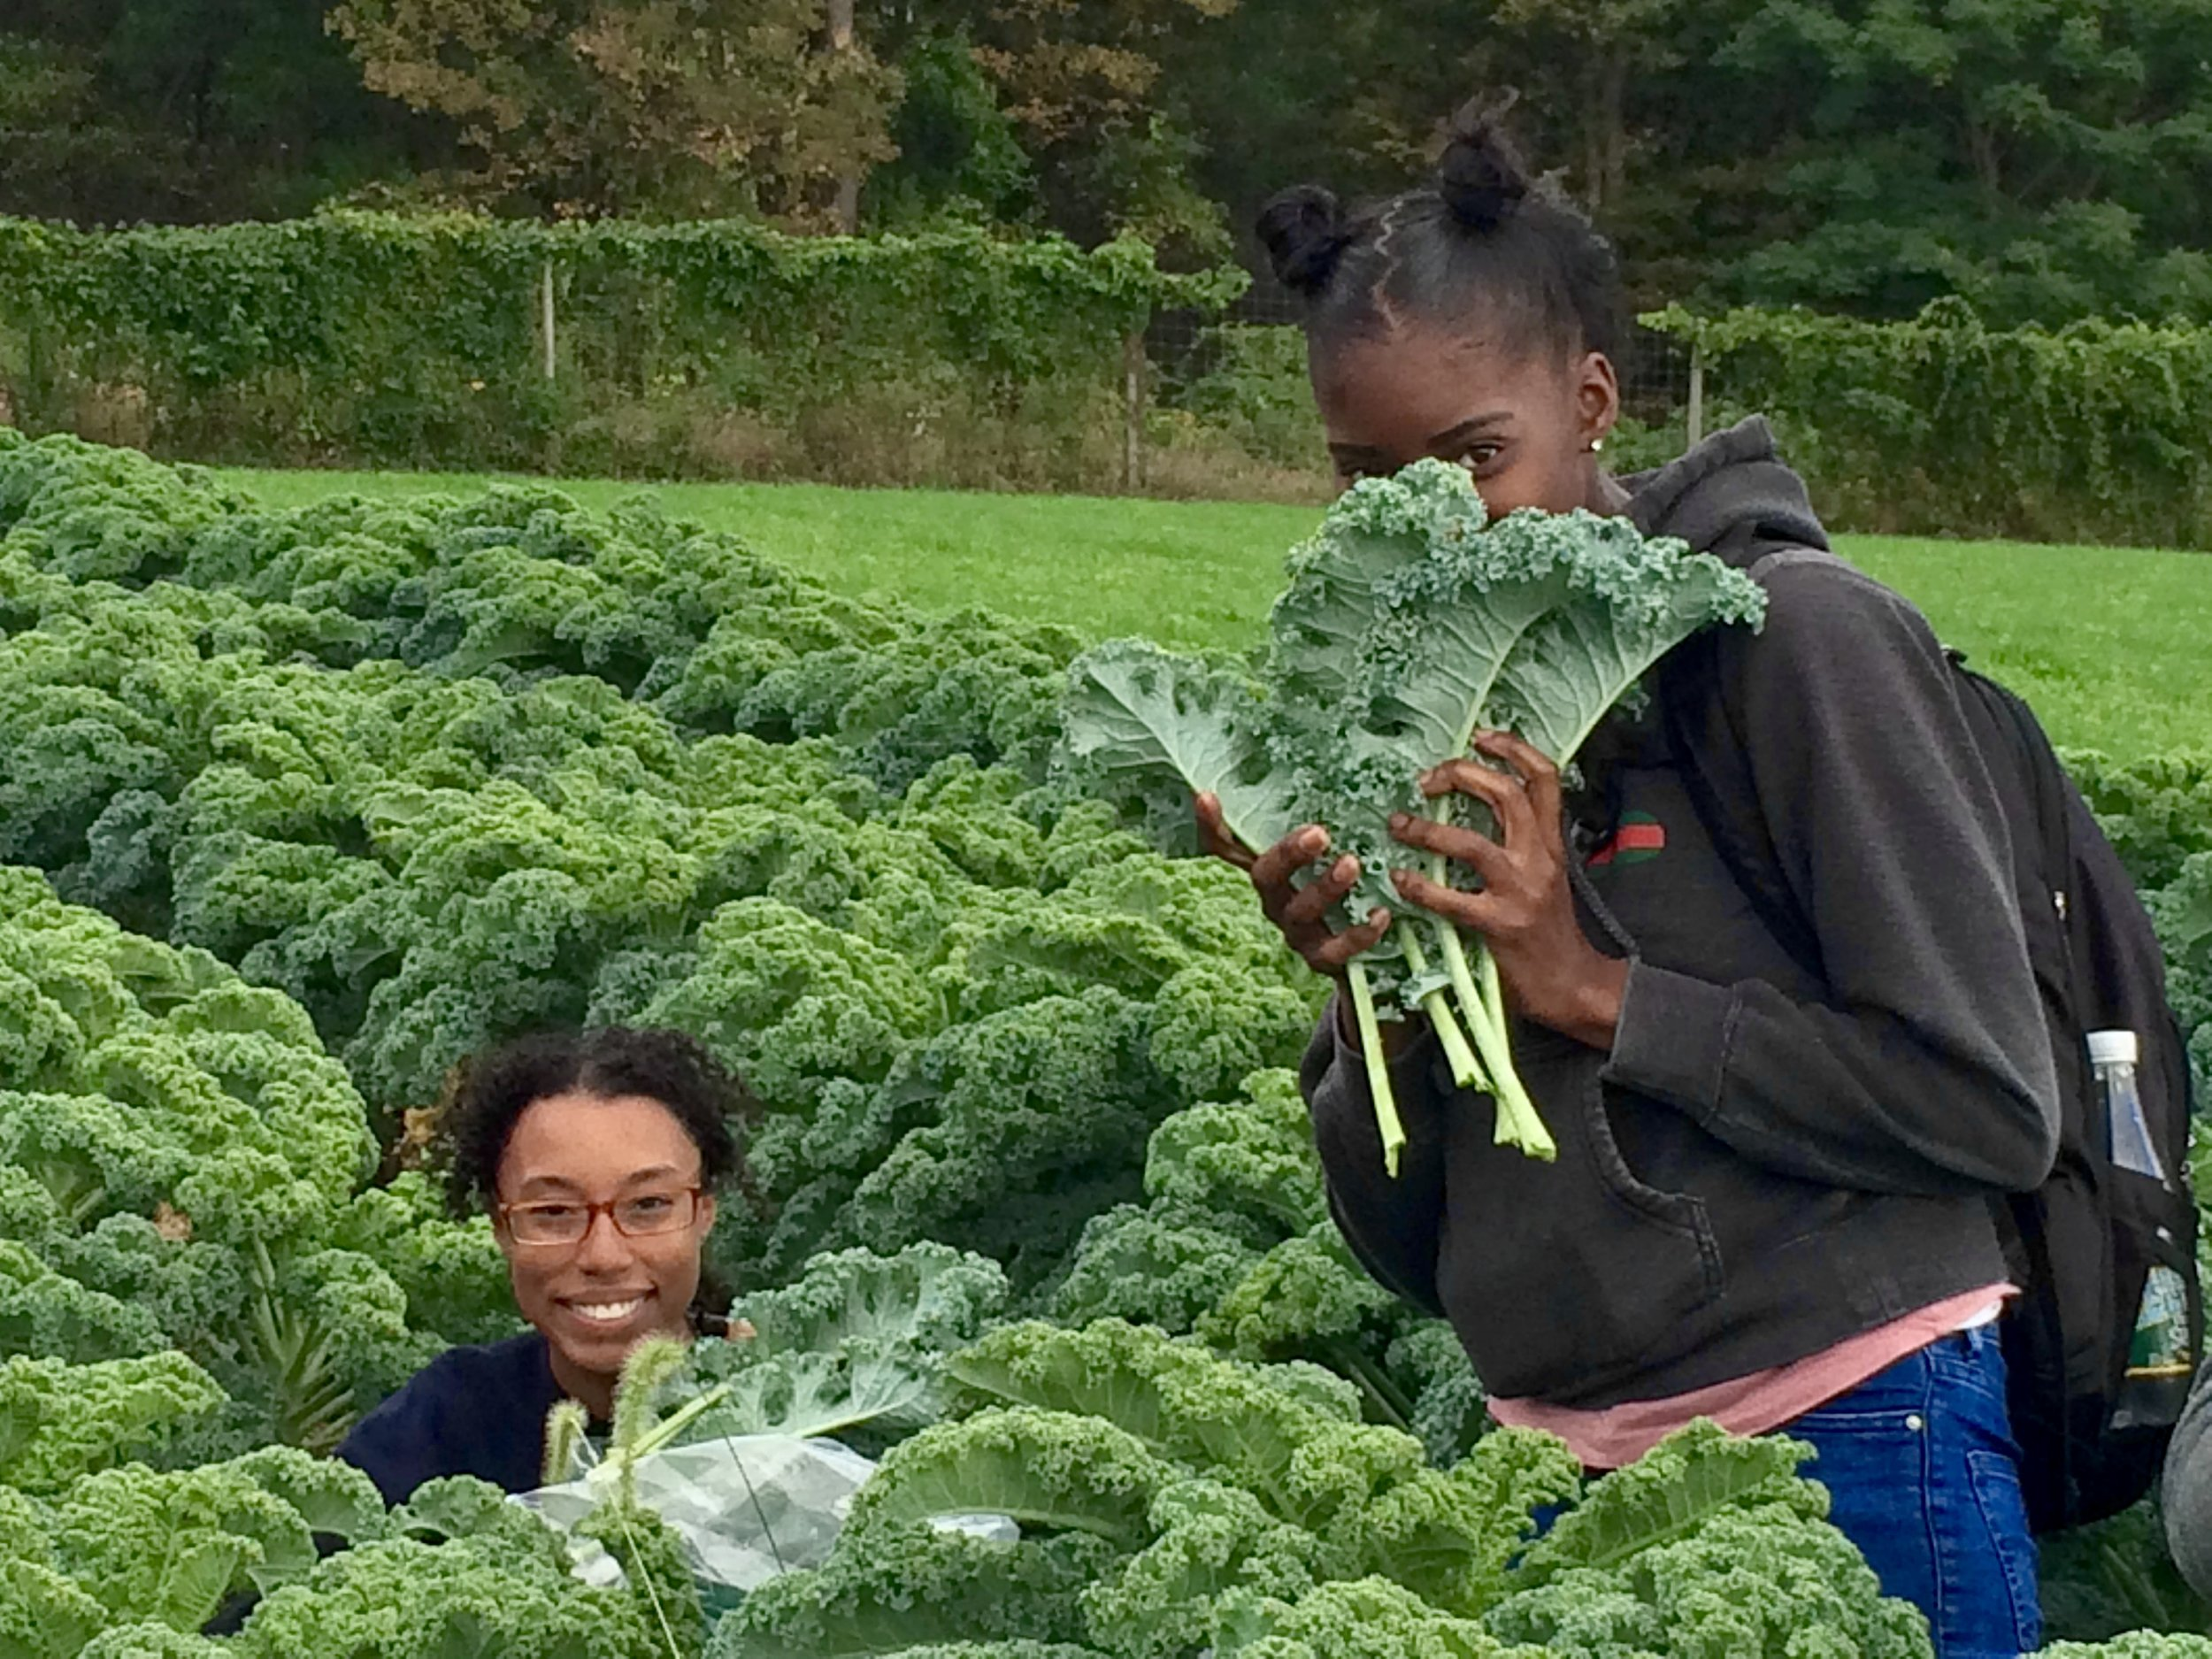 Alyssa and Rodnisha glean kale for Feeding the Hudson Valley.